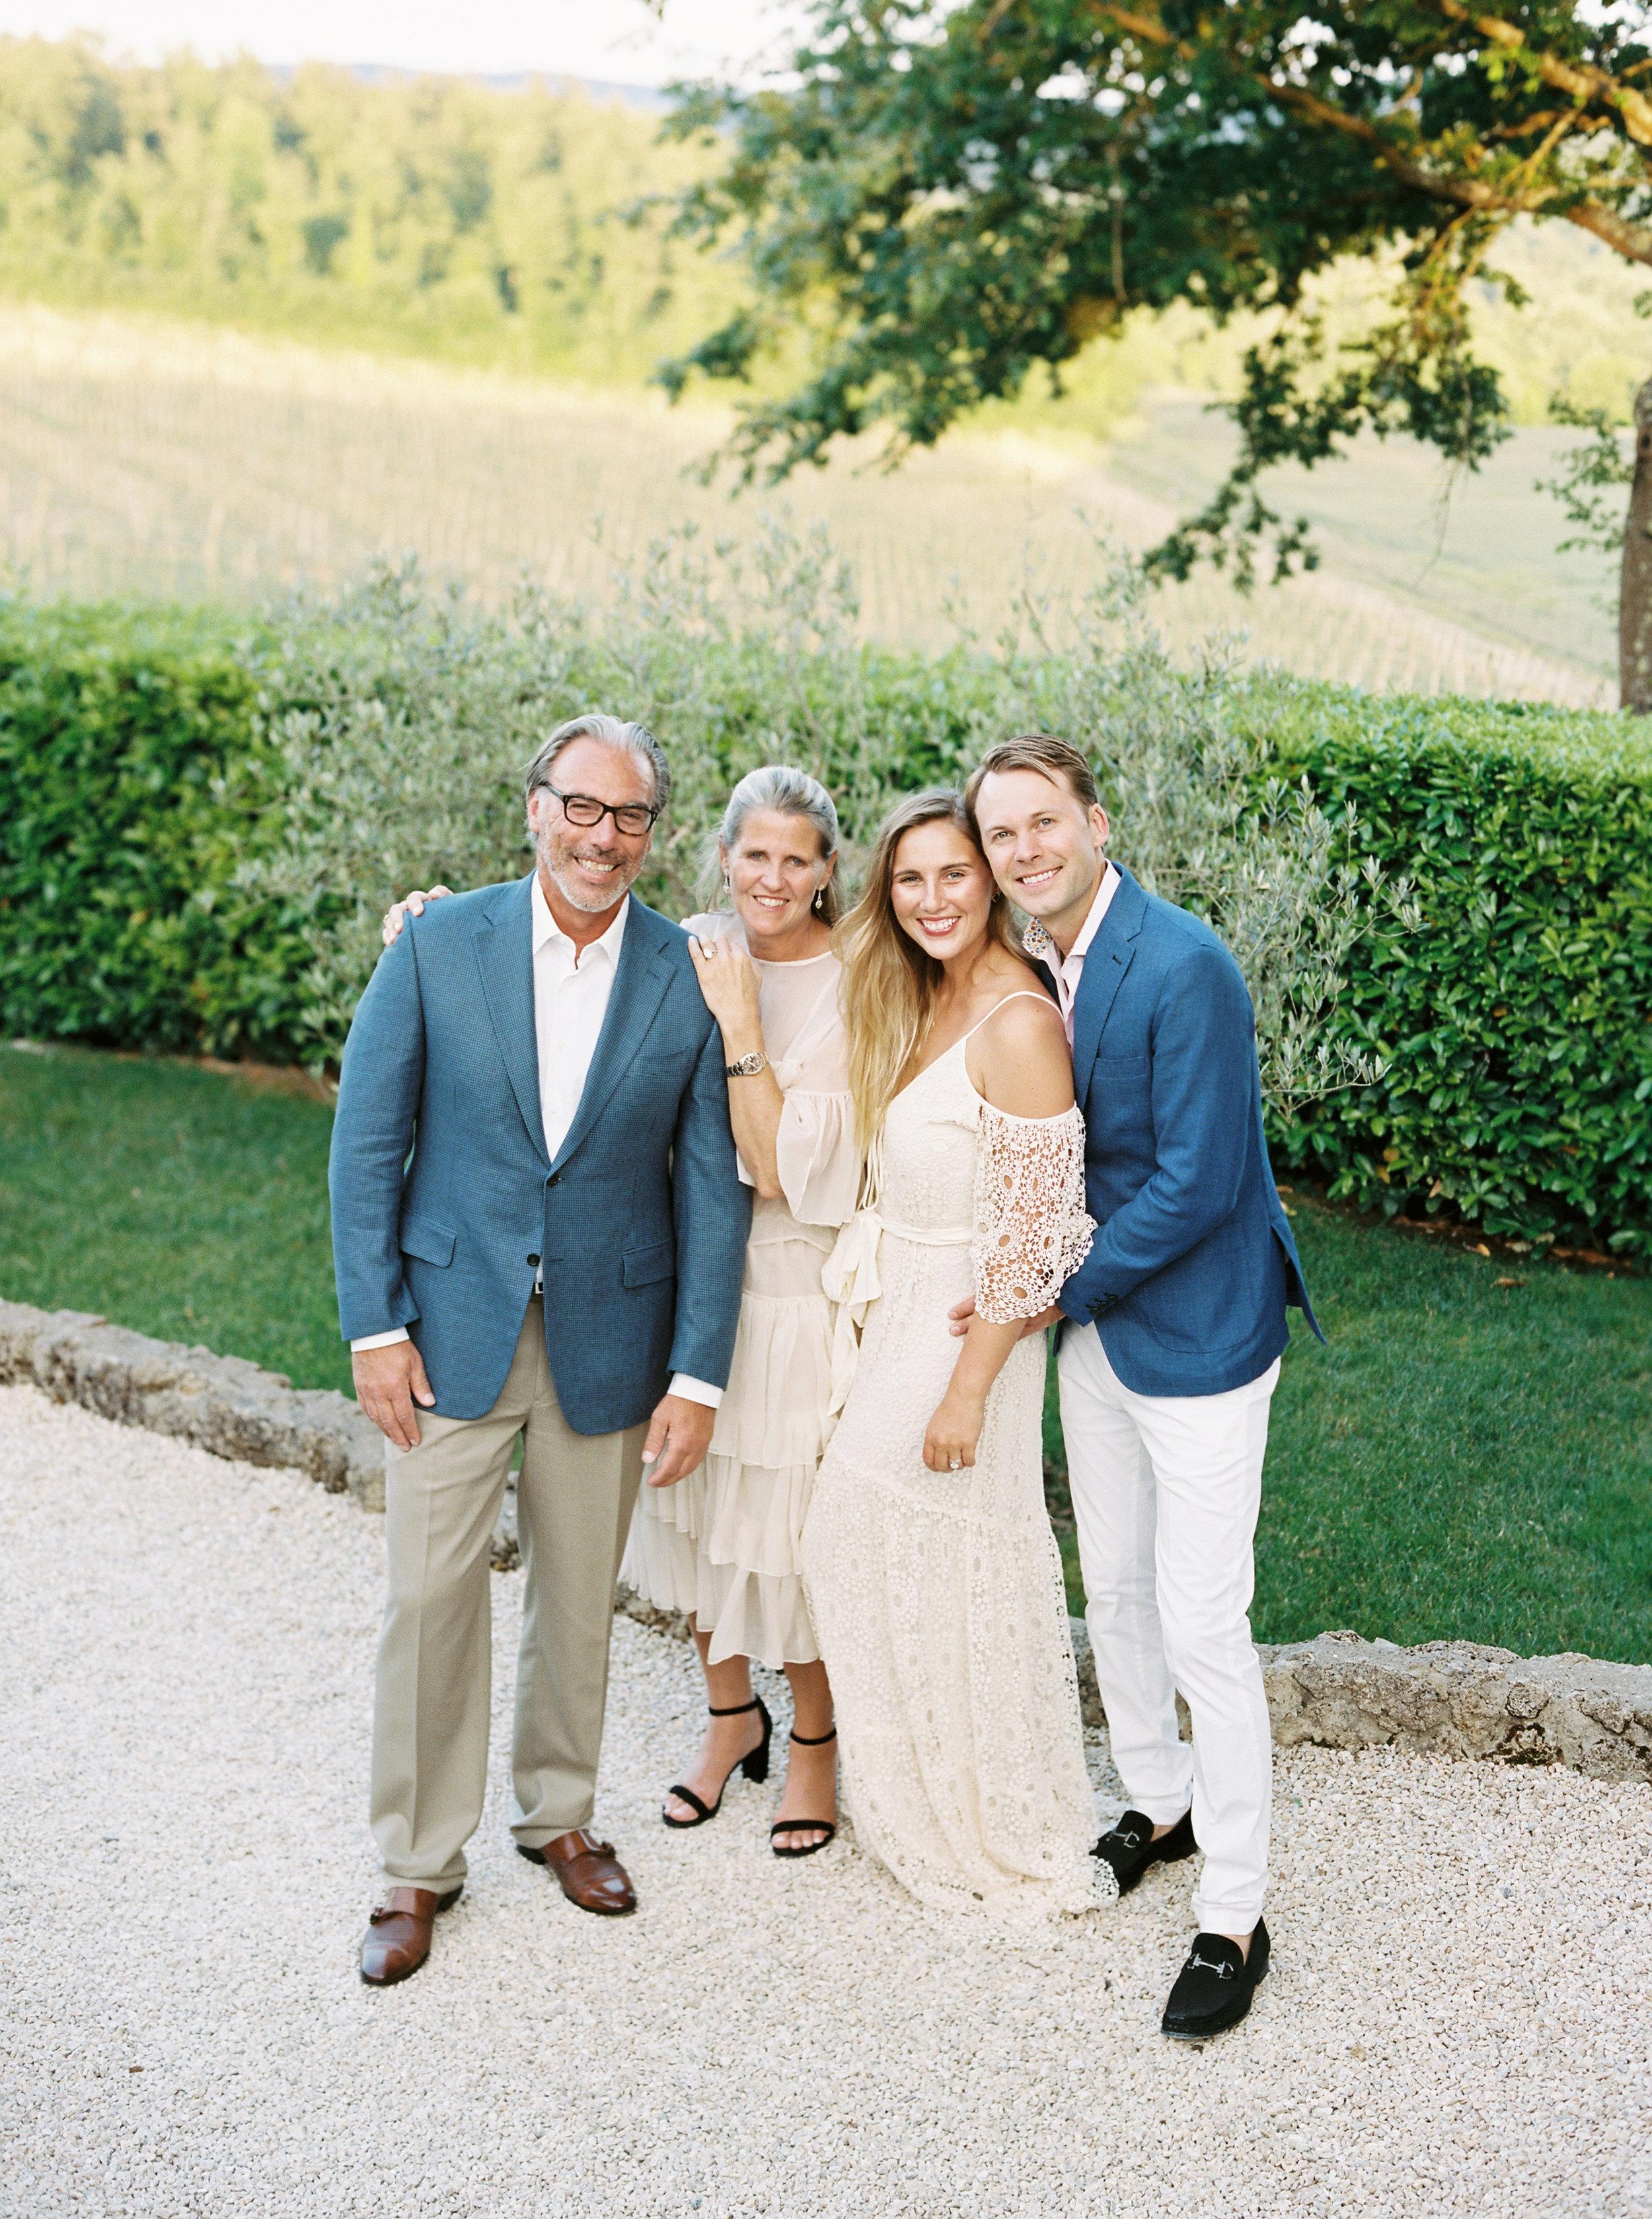 Kyle John l Fine Art Wedding Photography l Chicago, Copenhagen, California, New York, Destination l Blog l Alexis and Zach_Borgo Santo Pietro_Italy_Tuscany_13